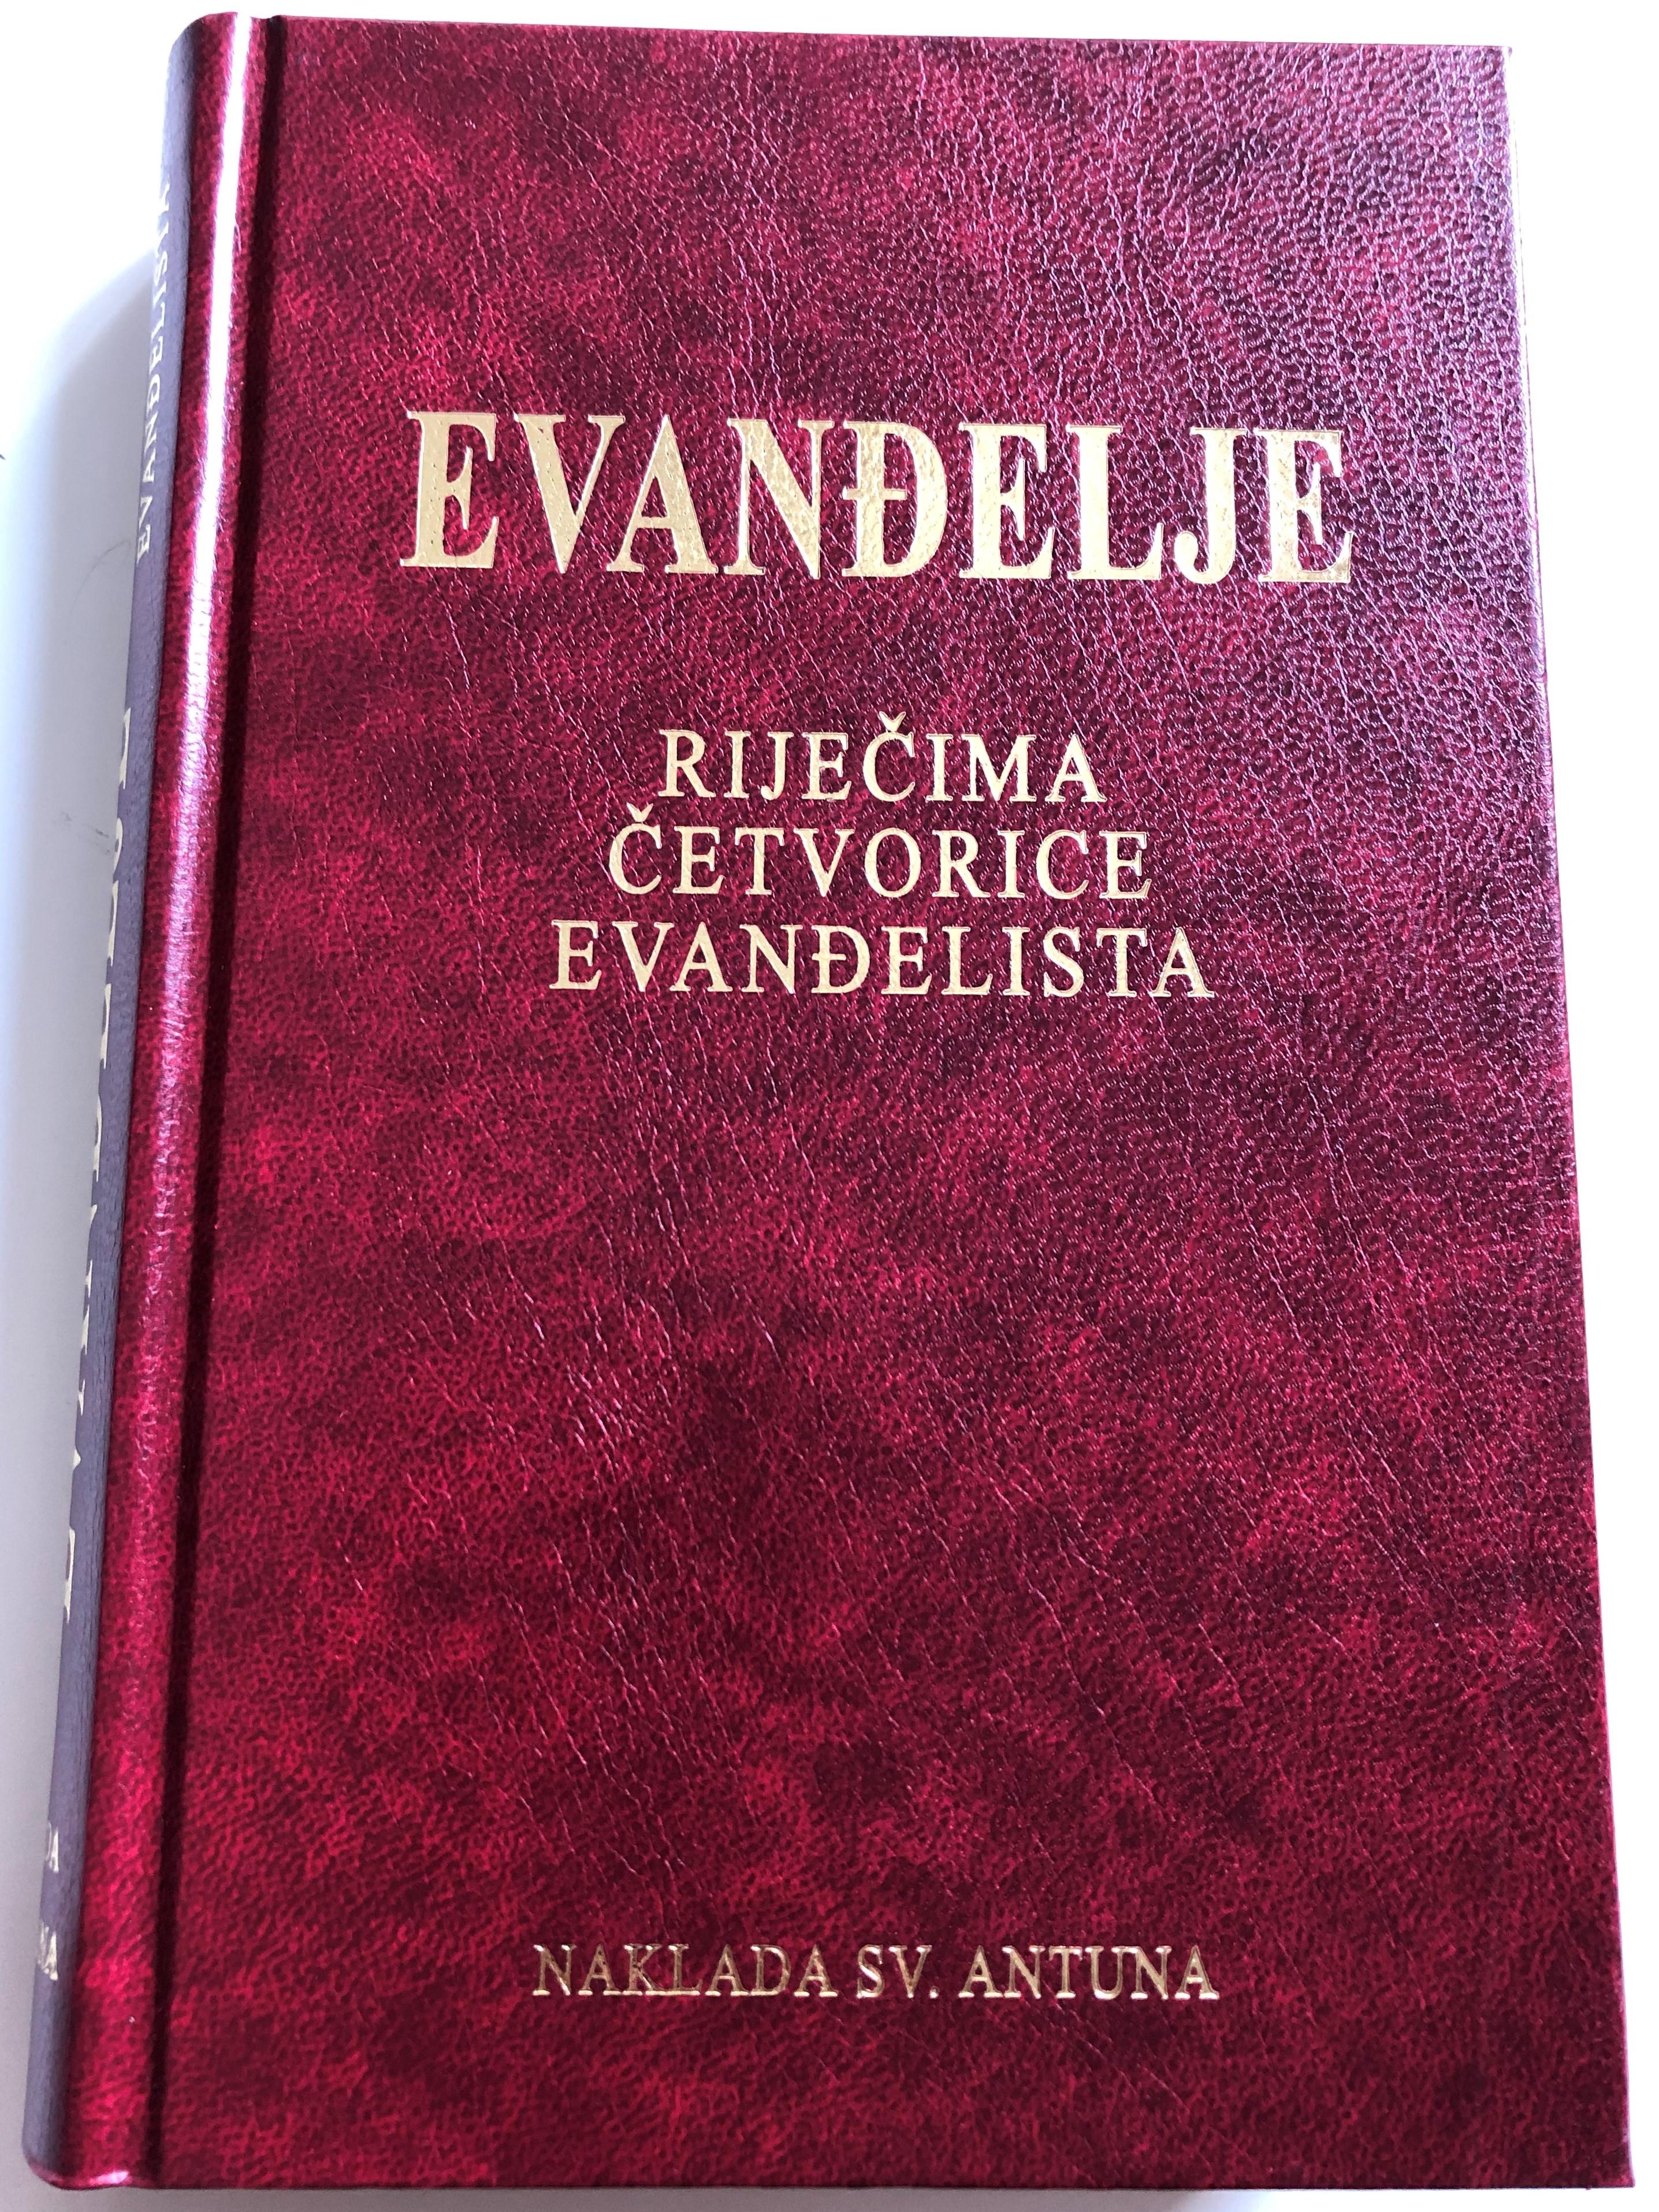 evan-elje-re-ima-etvorice-evan-elista-croatian-language-edition-of-il-vangelo-1.jpg